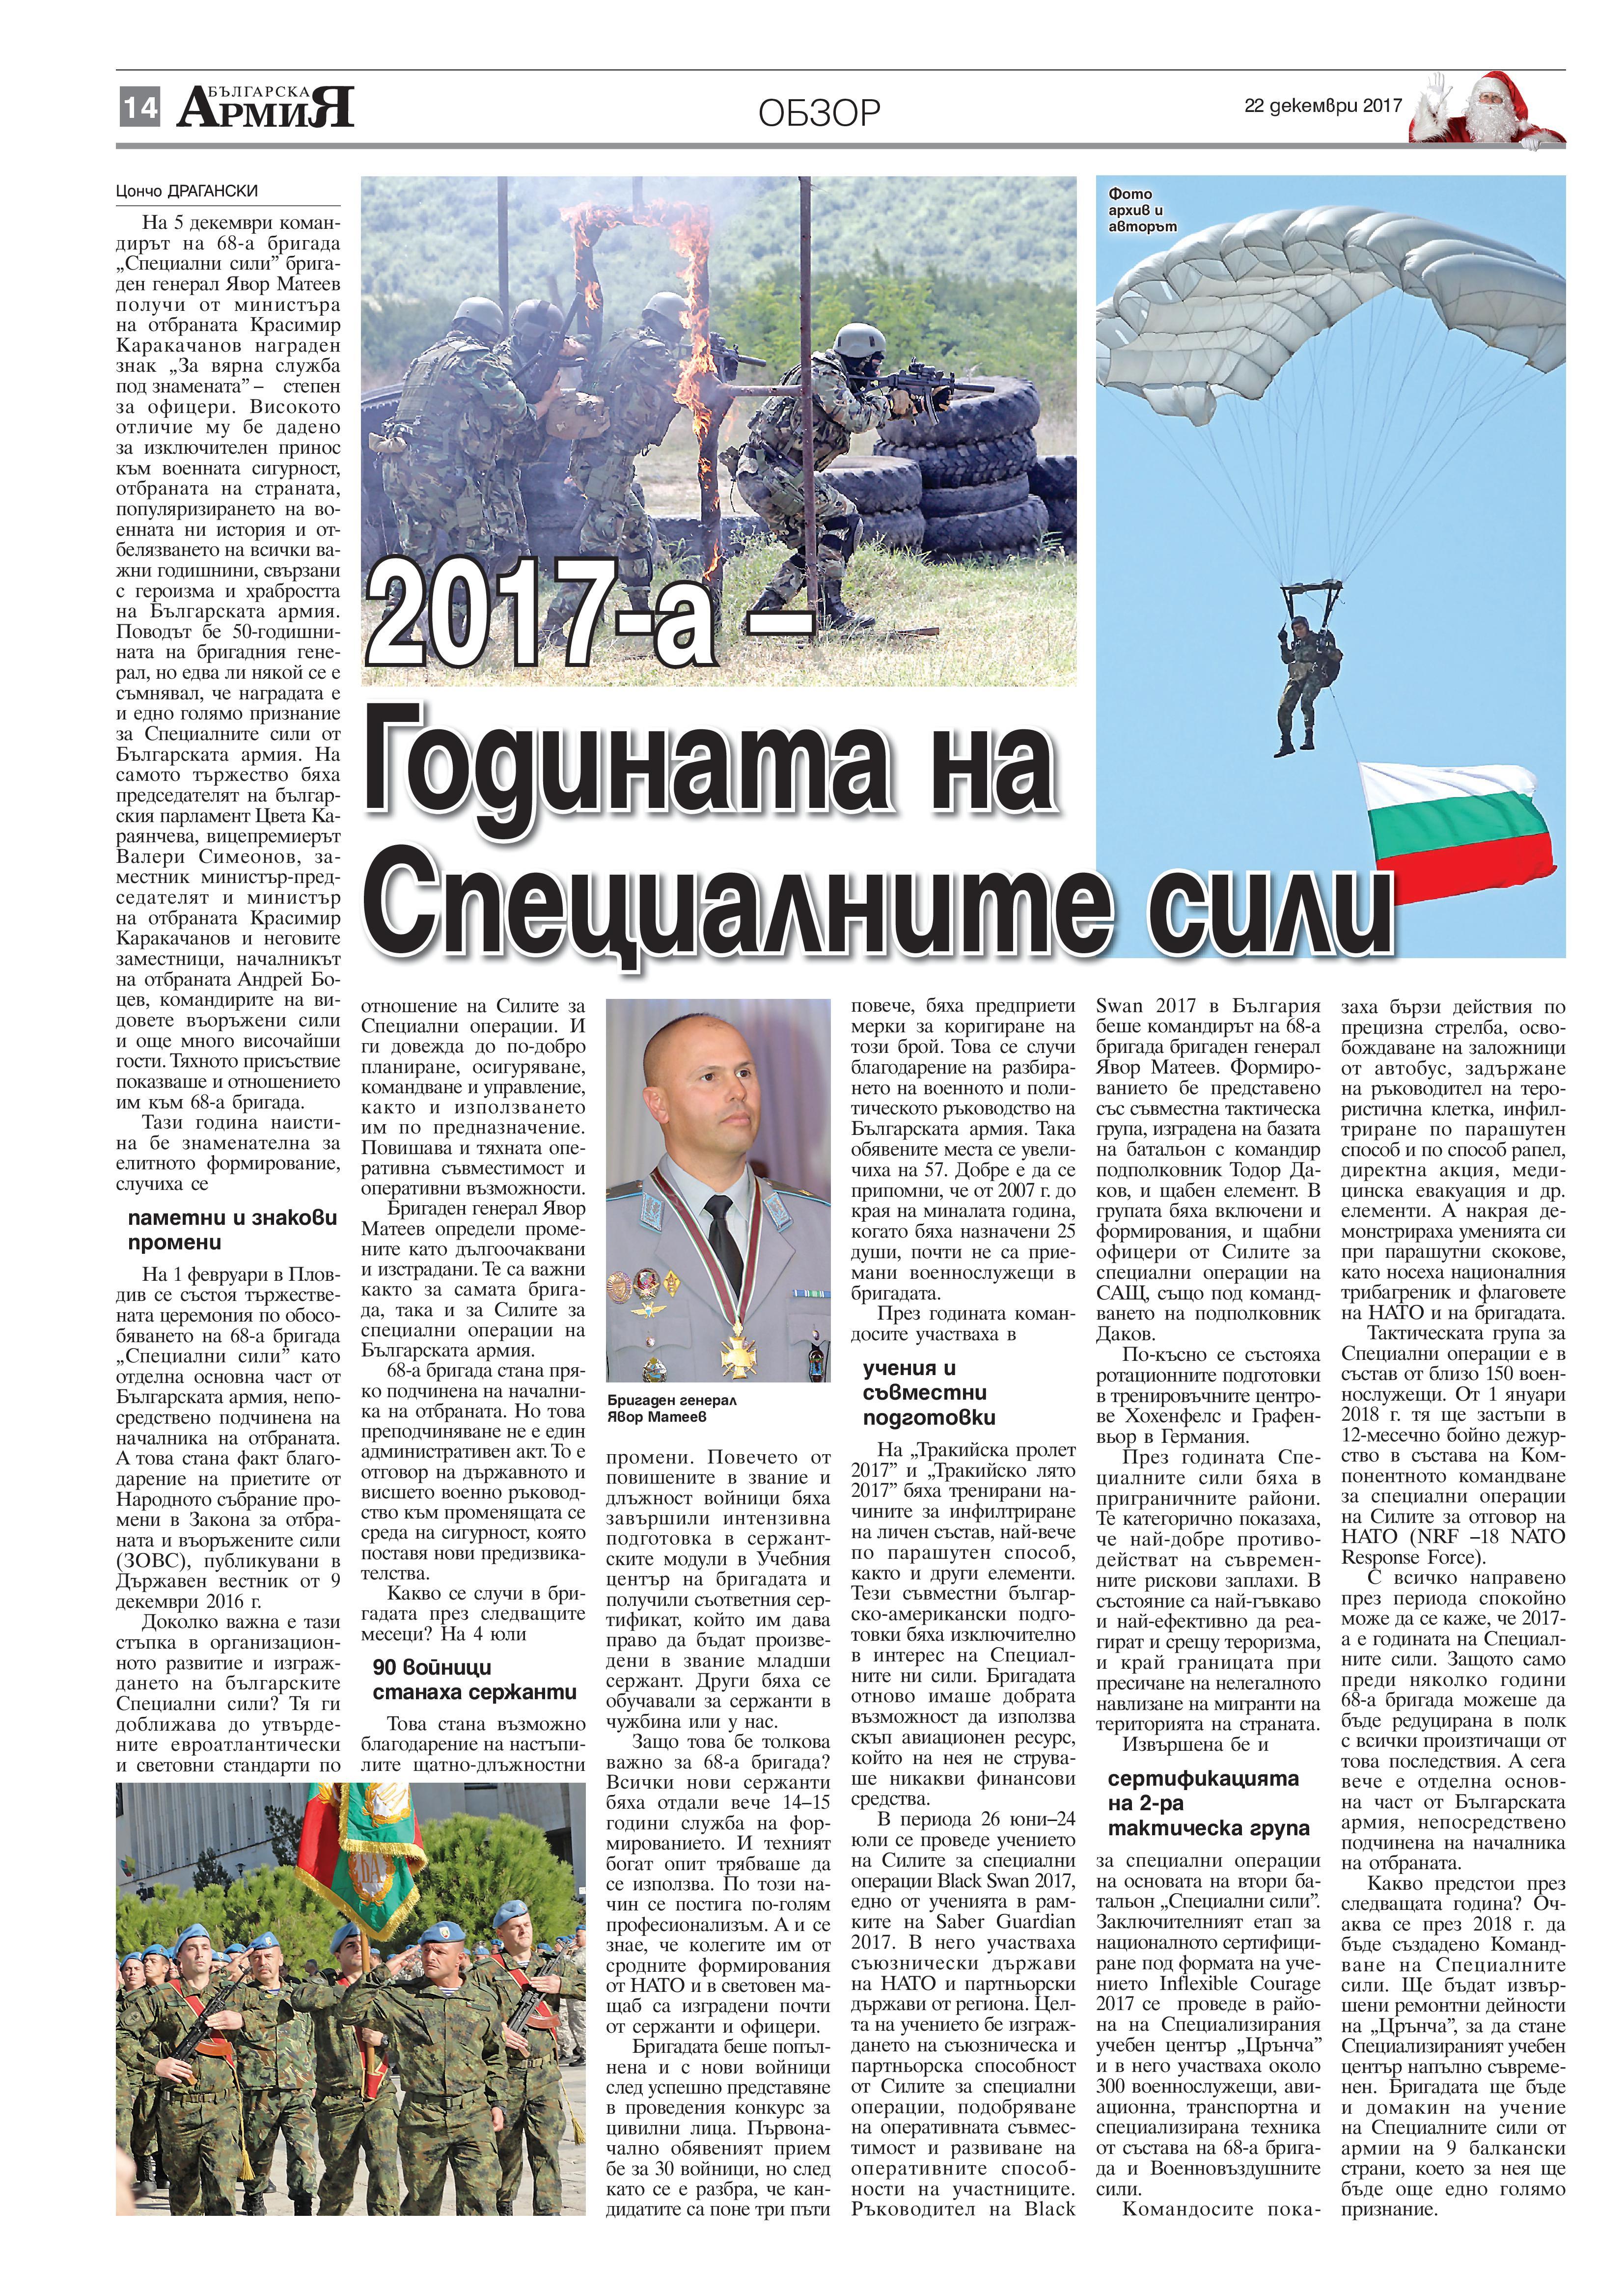 http://armymedia.bg/wp-content/uploads/2015/06/14-16.jpg